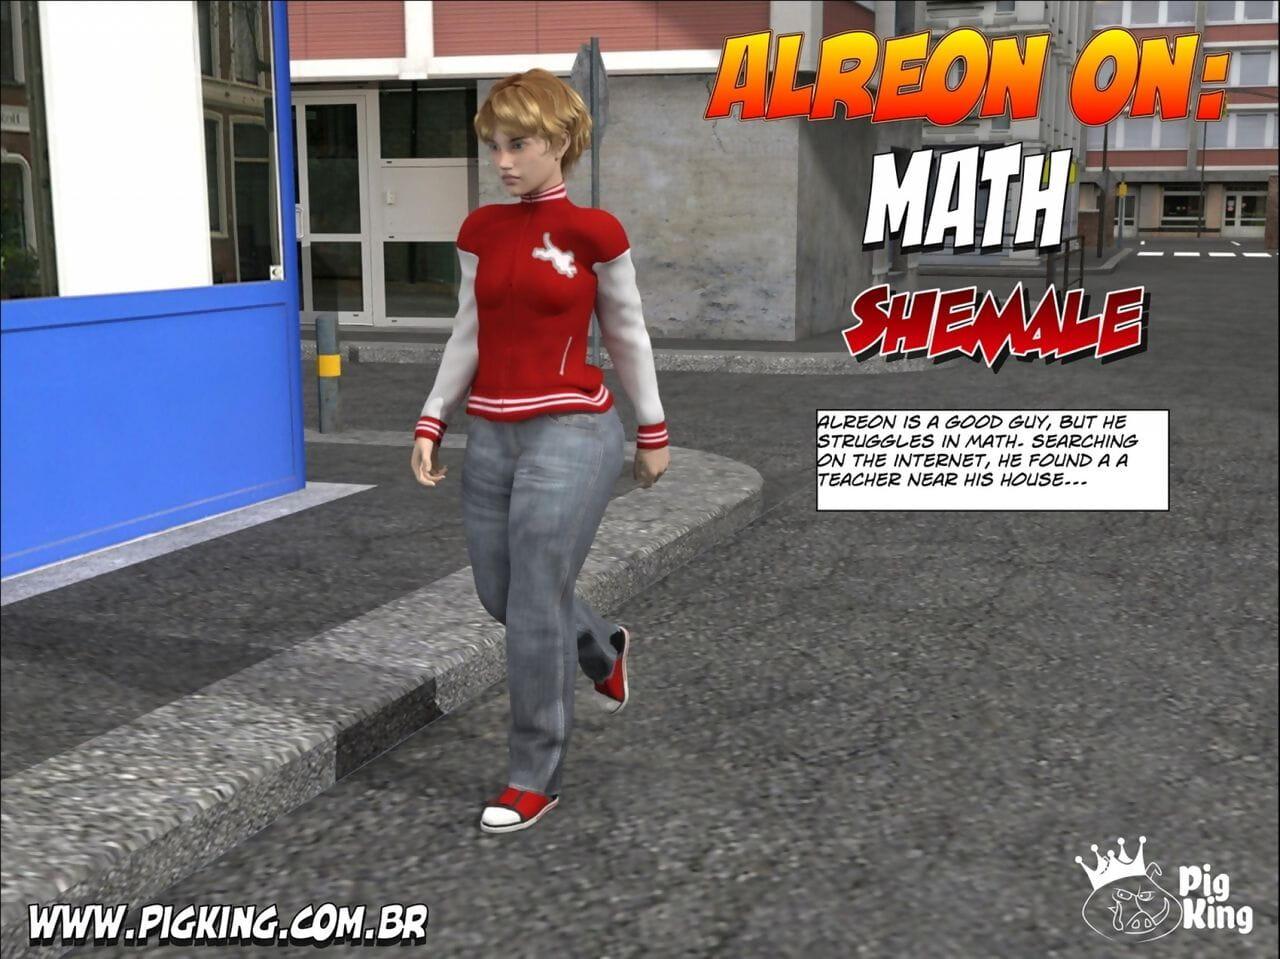 PigKing Alreon surpassing - Math Shemale